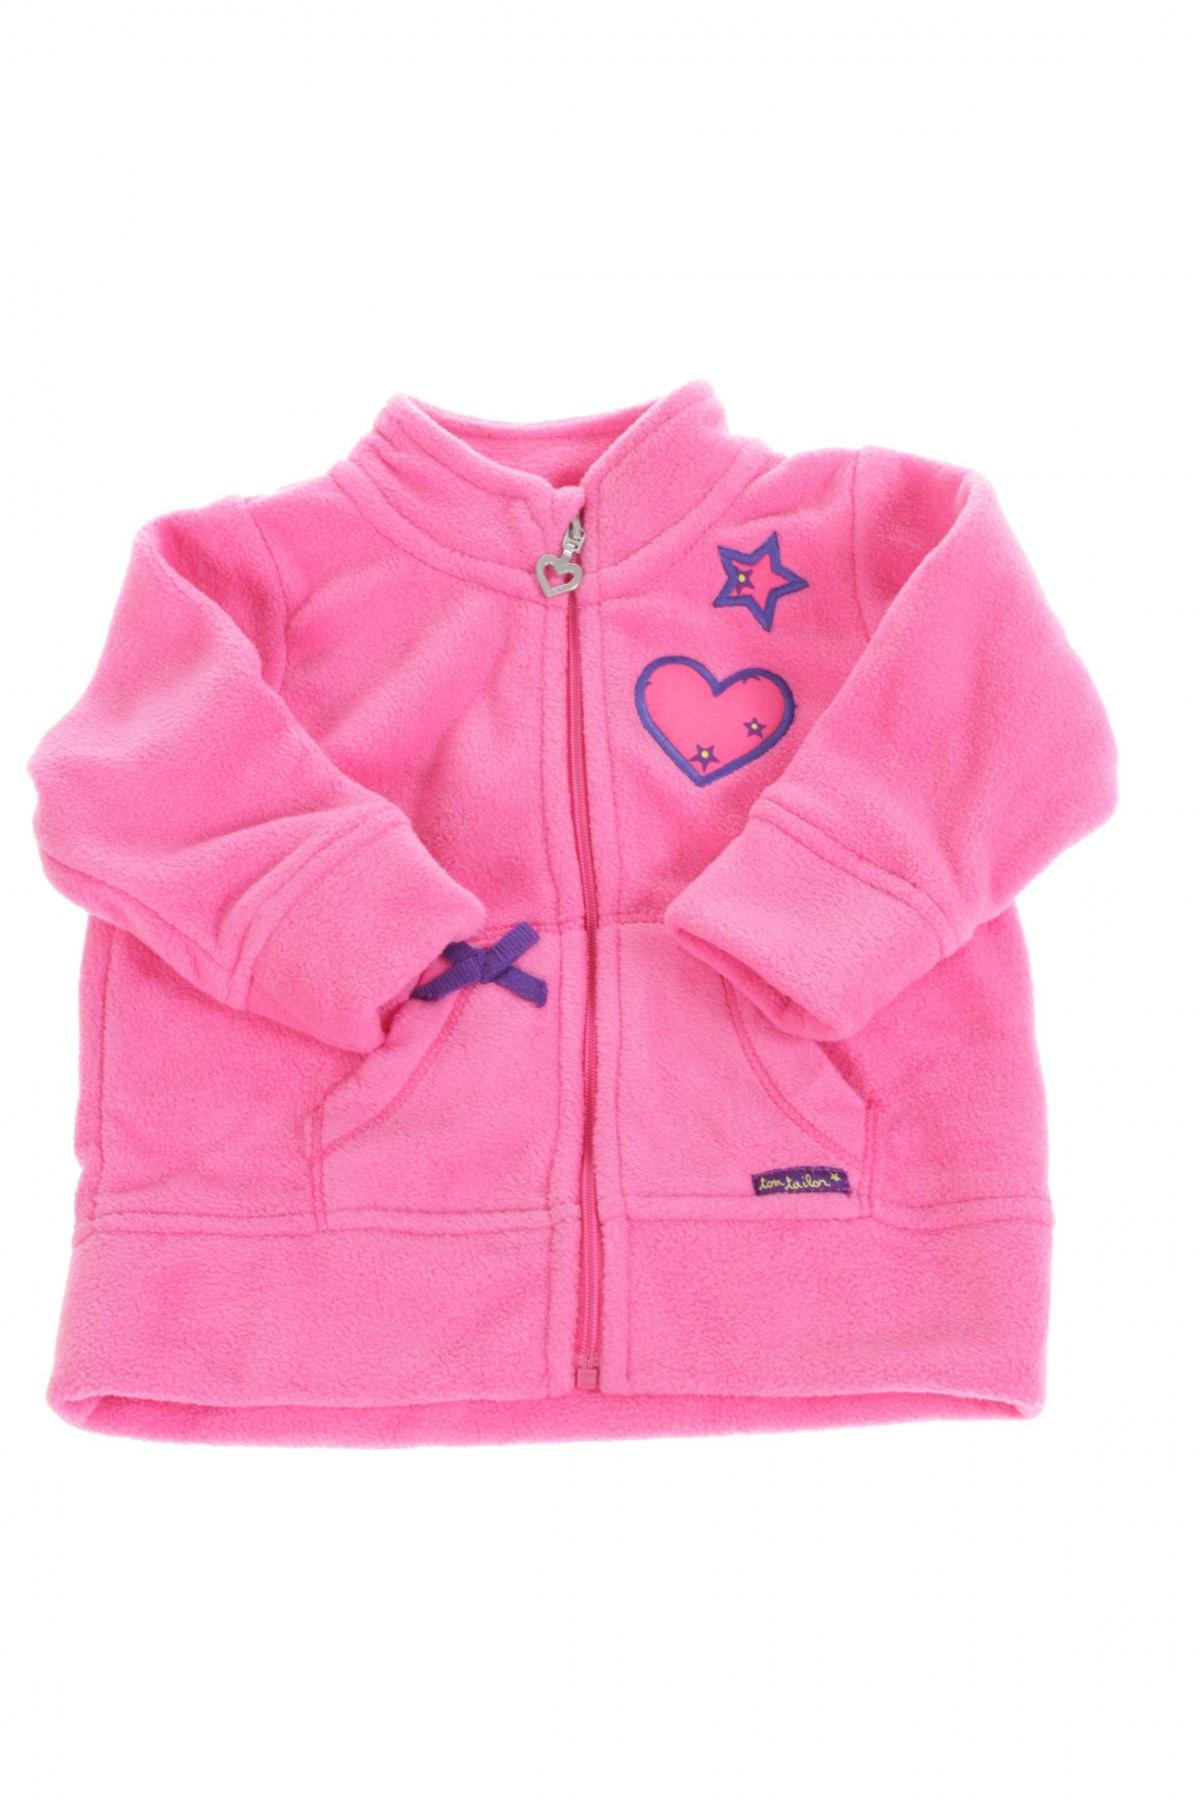 large discount outlet online cute cheap Kinder Fleece Tom Tailor